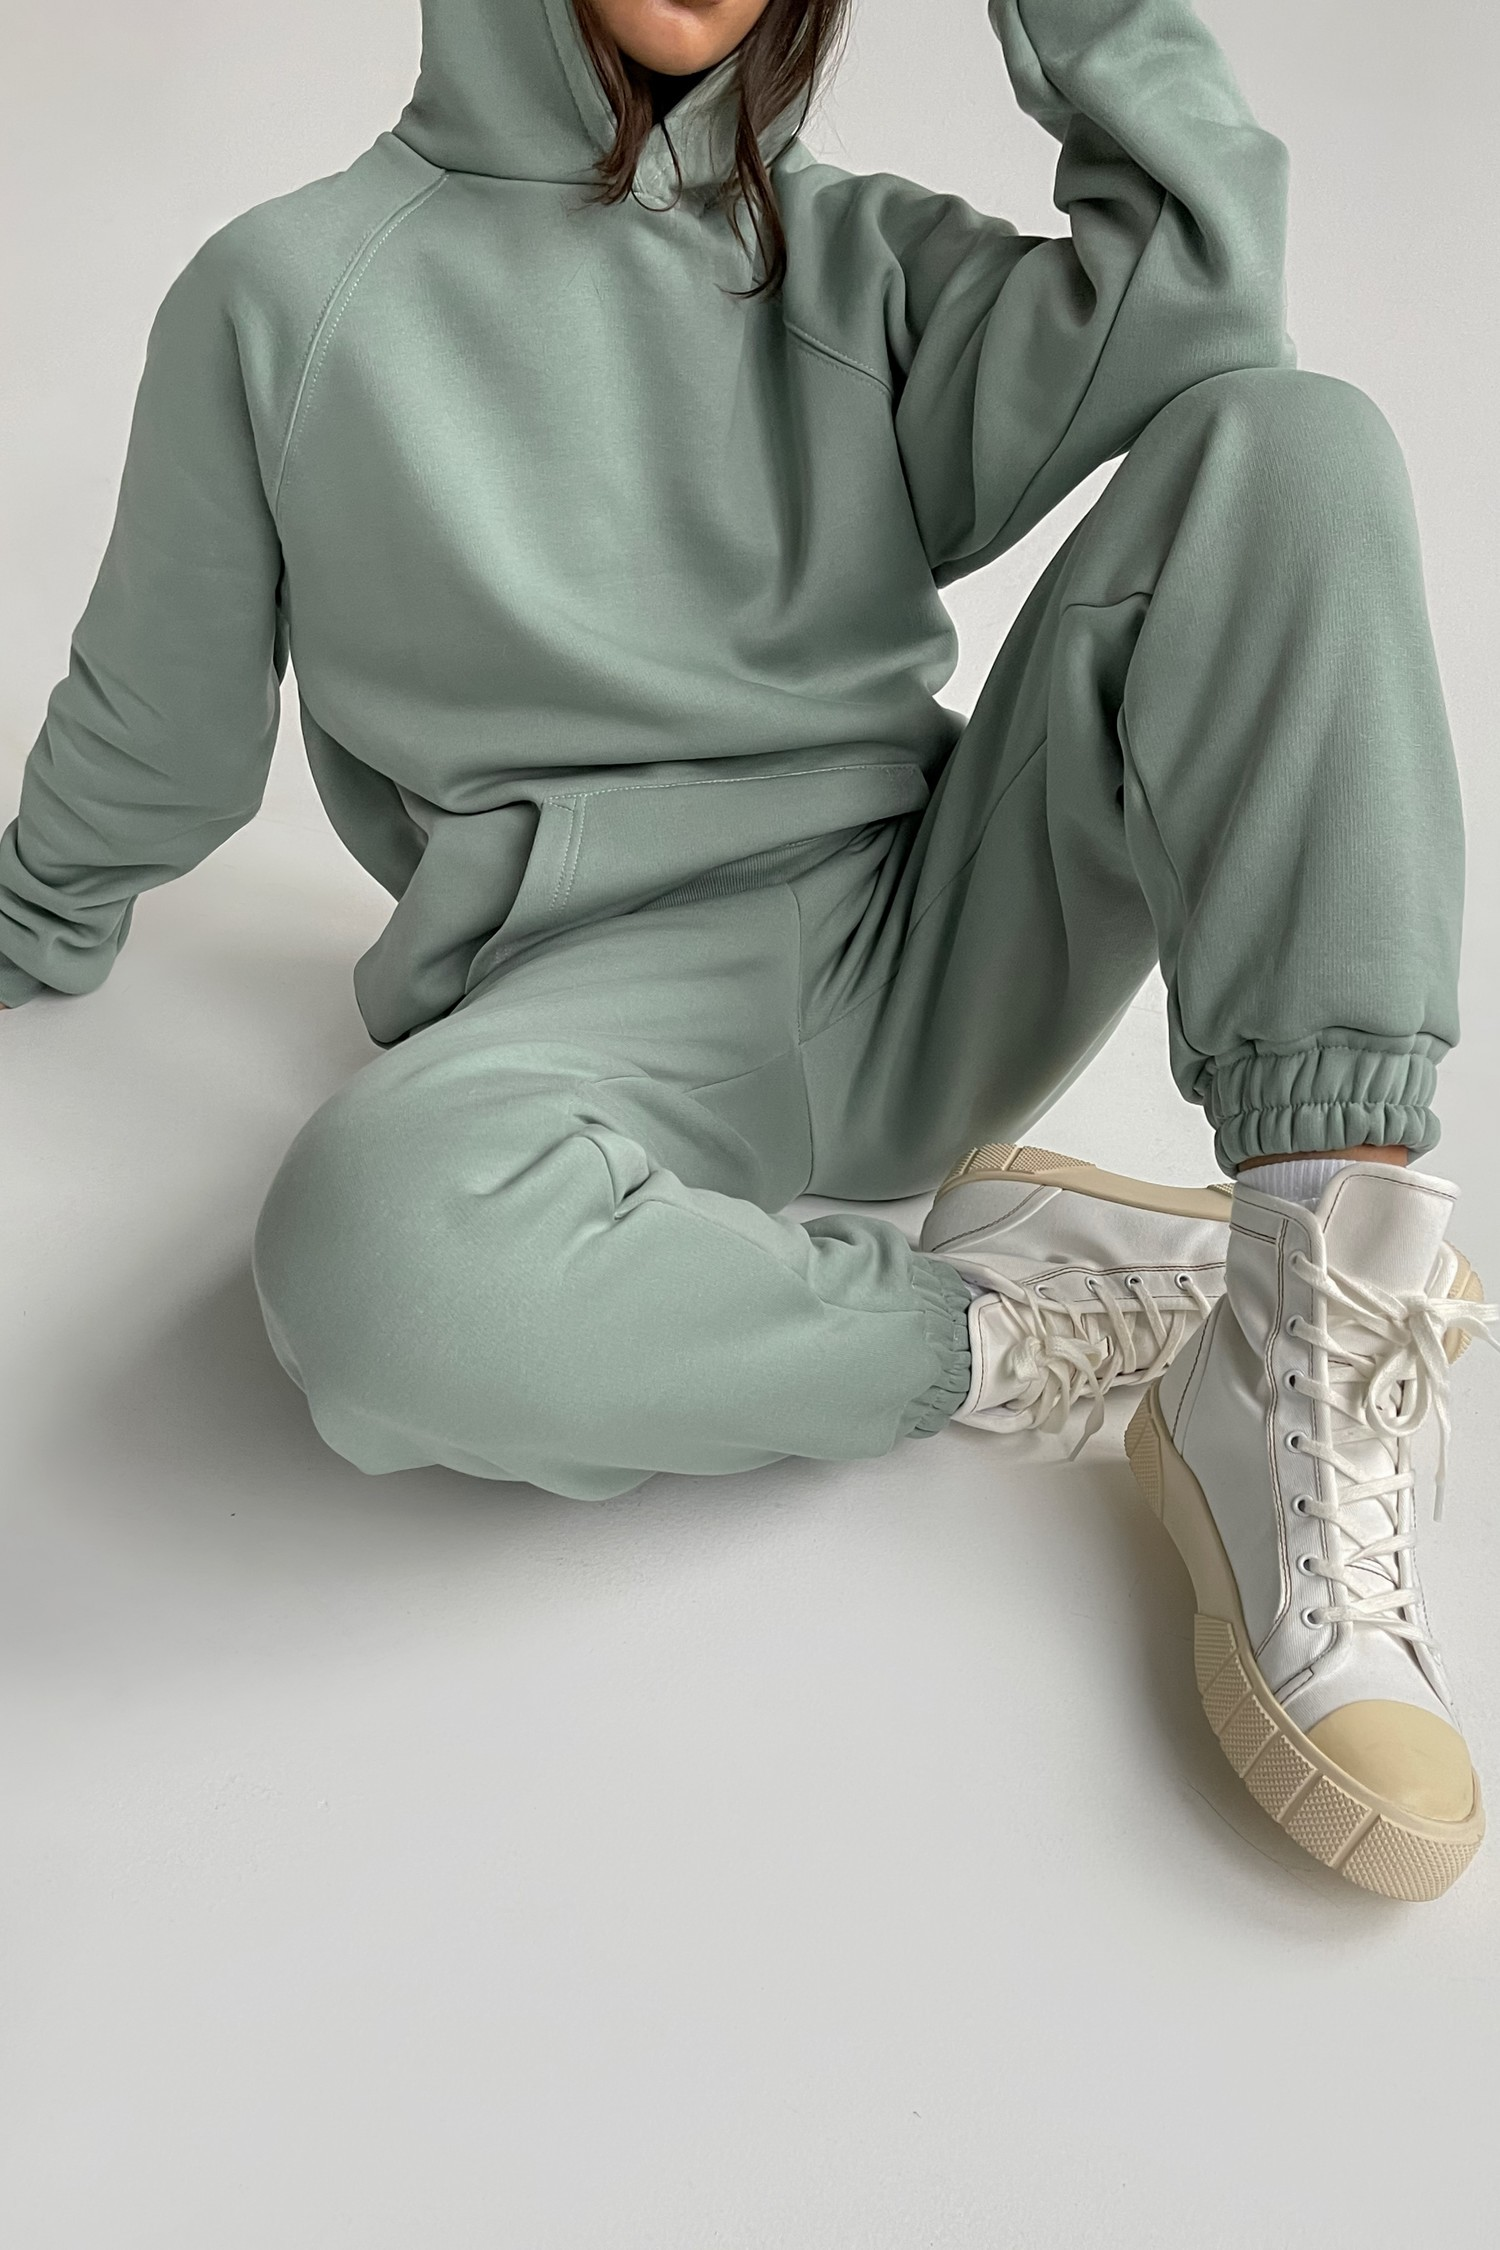 Костюм со спортивными брюками и худи mint - THE LACE